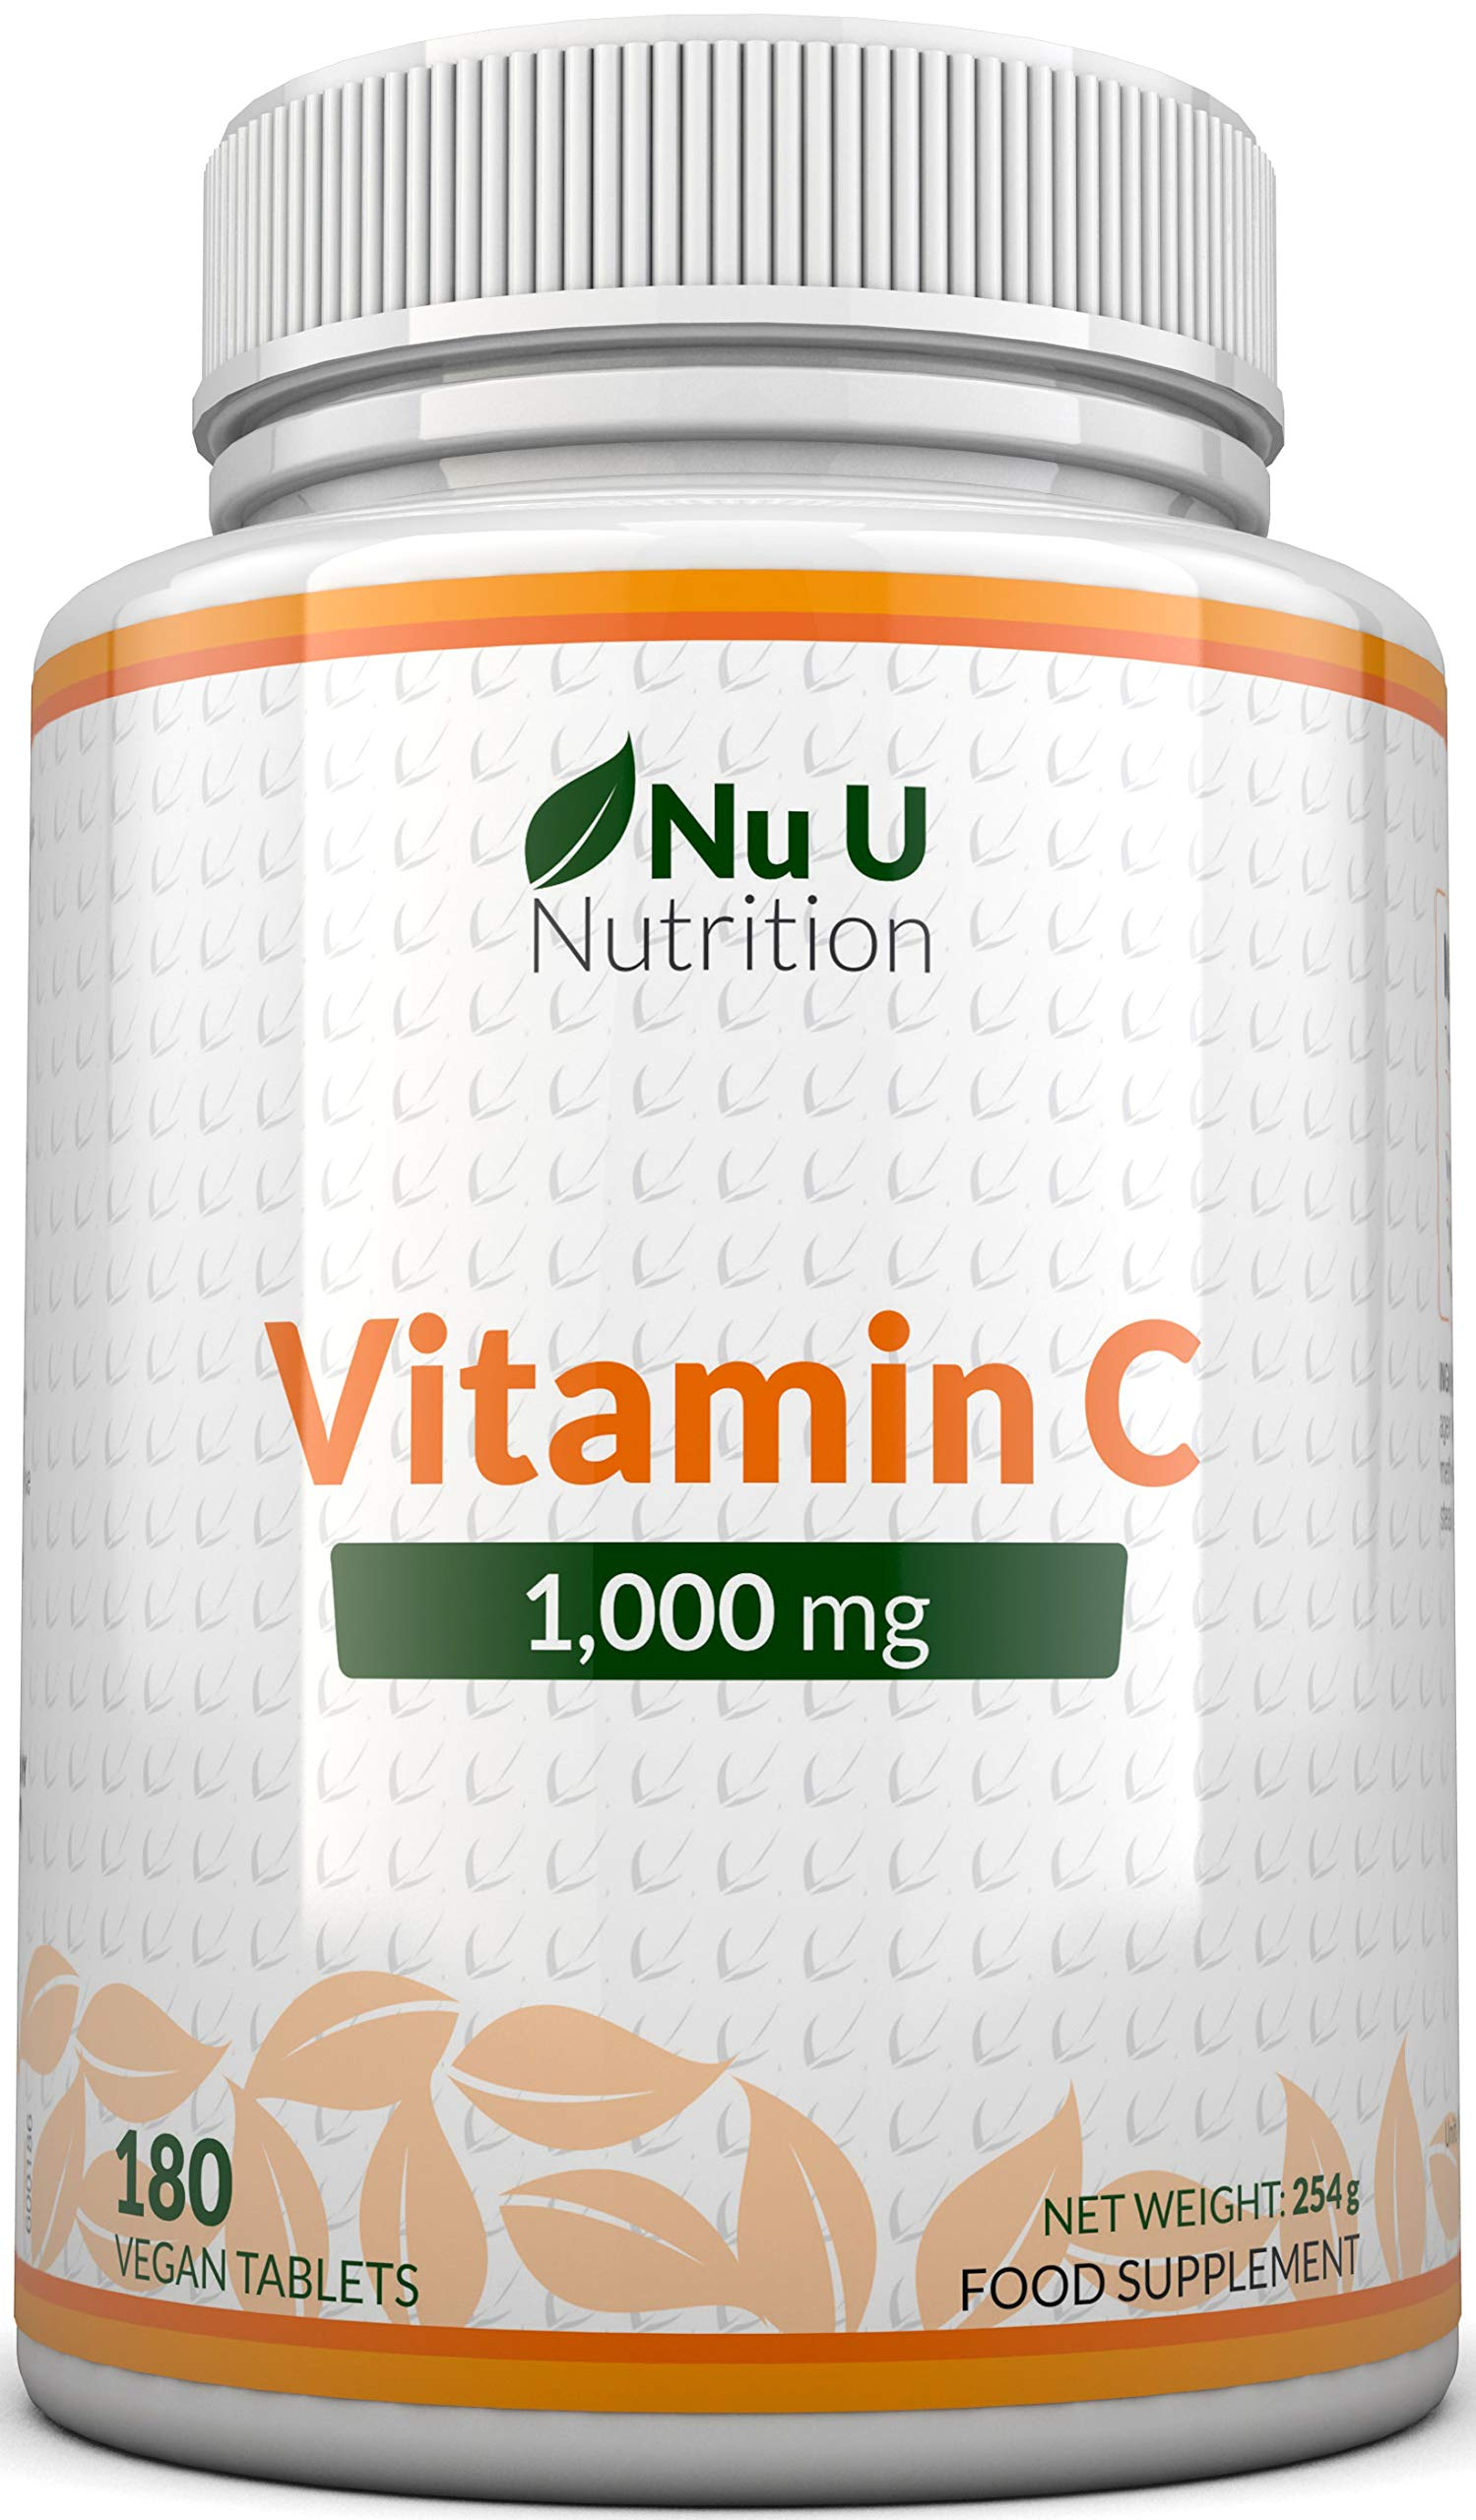 Vitamin C 1000mg | 180 Tablets (6 Month's Supply) | Ascorbic Acid, Suitable for Vegetarians & Vegans by Nu U Nutrition